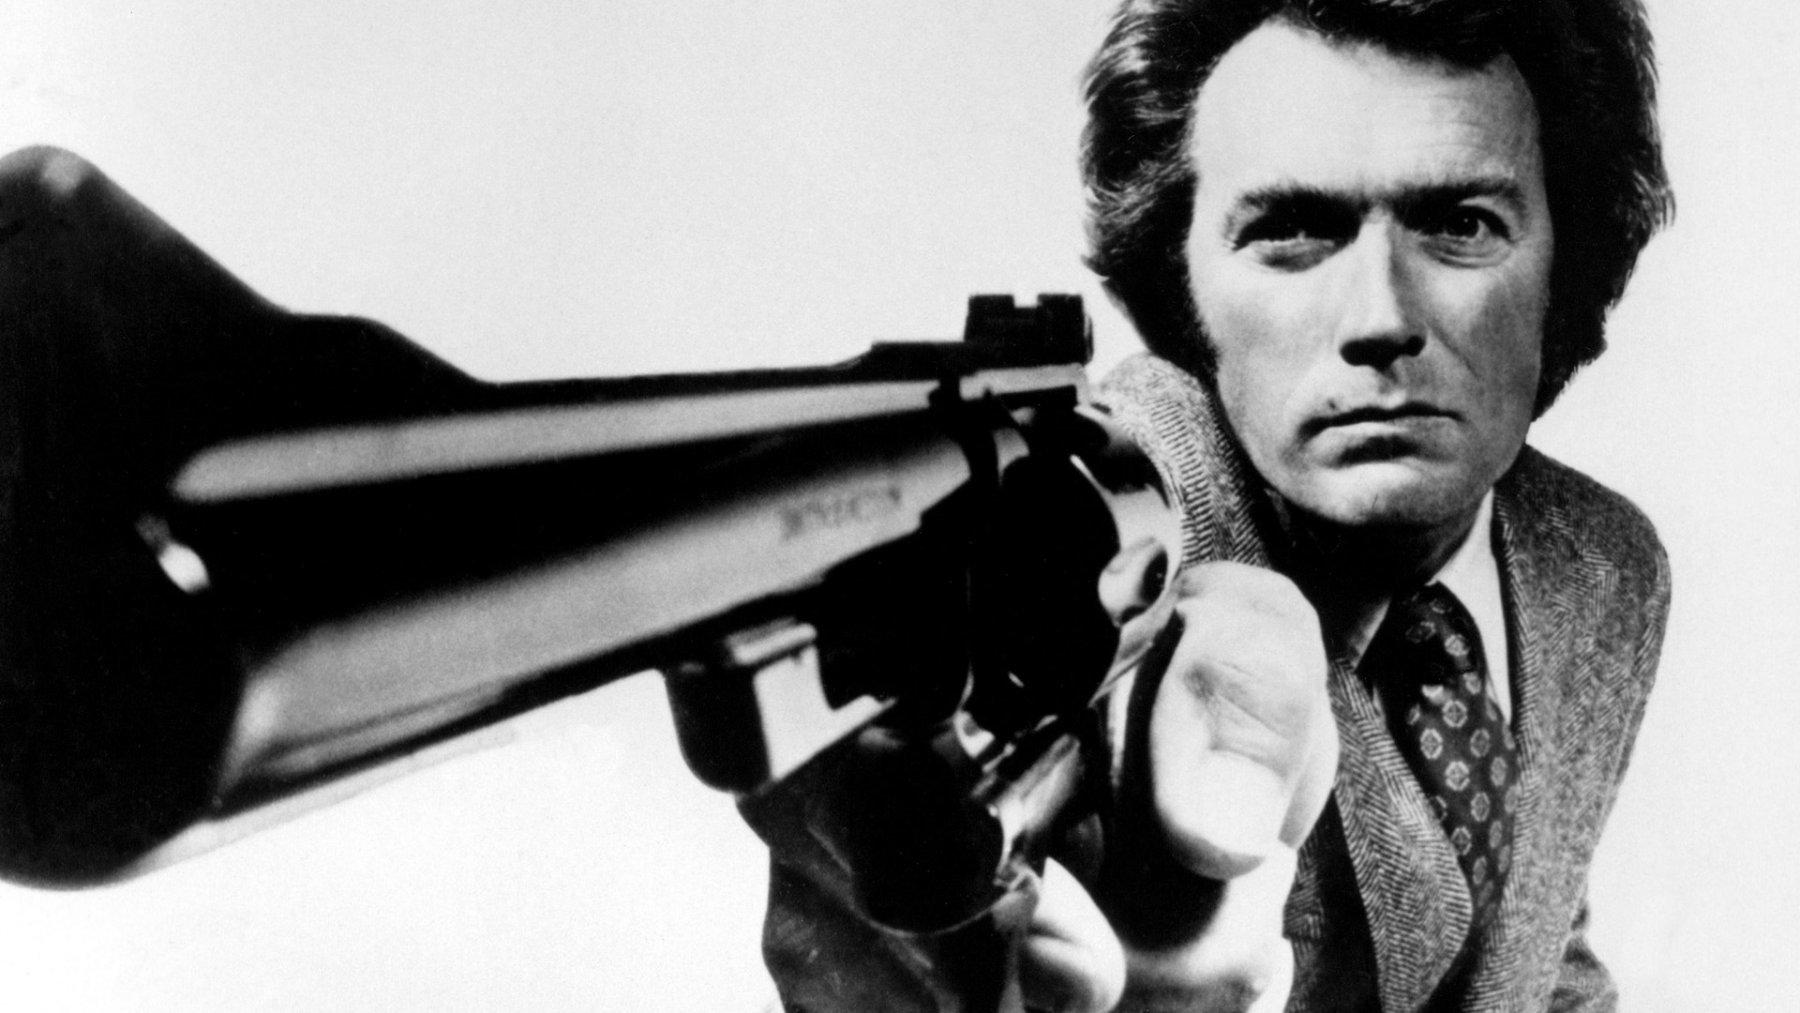 Films - Magnum Force  Clint Eastwood Harry Callahan Fond d'écran